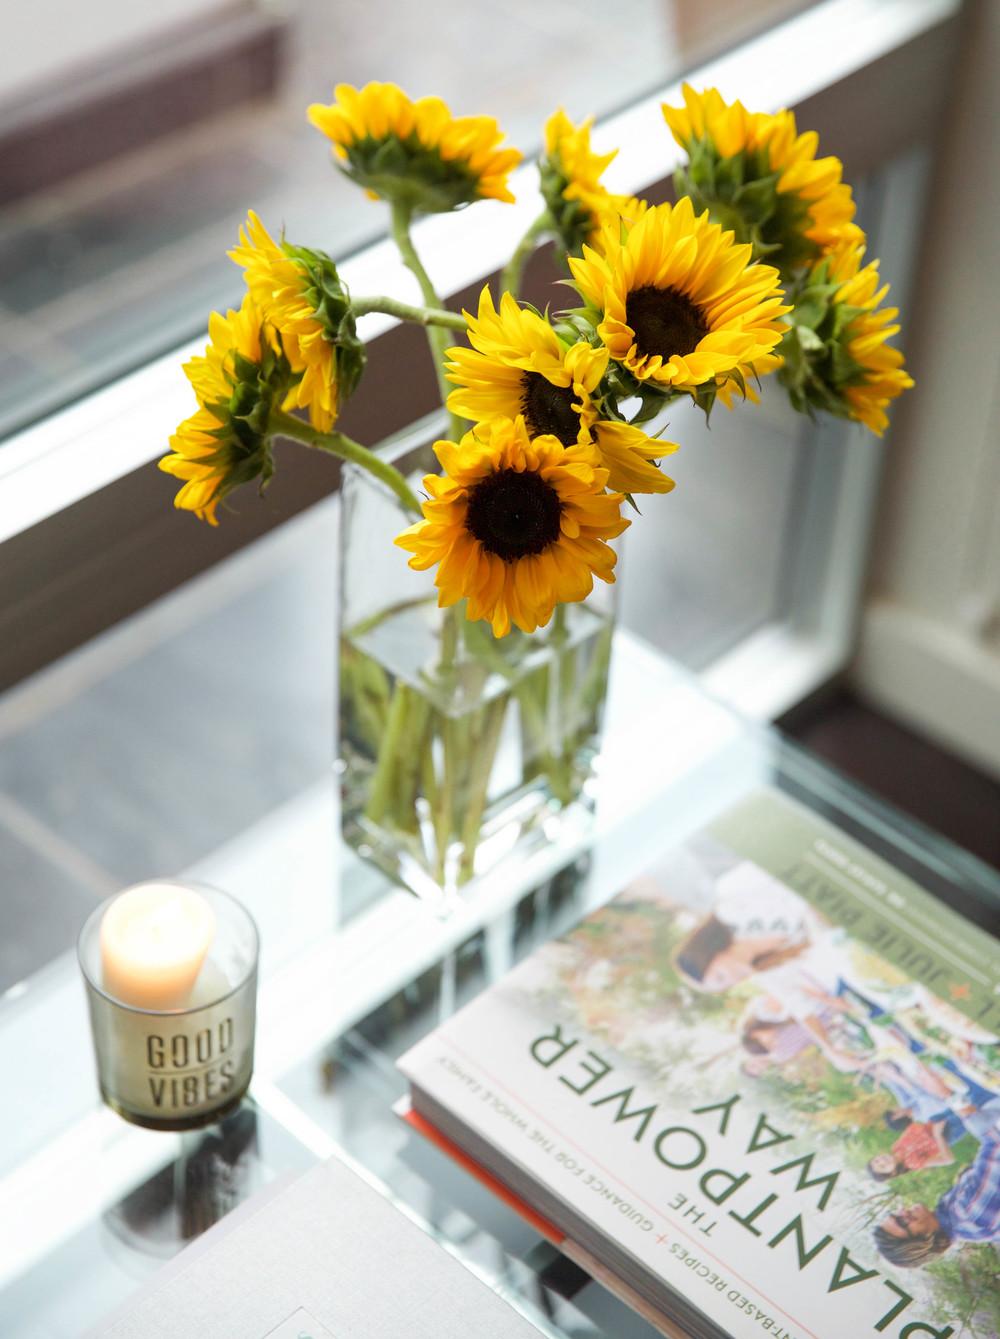 Sunflowers-LaurenSchwaiger-Life-Style-Blog.jpg